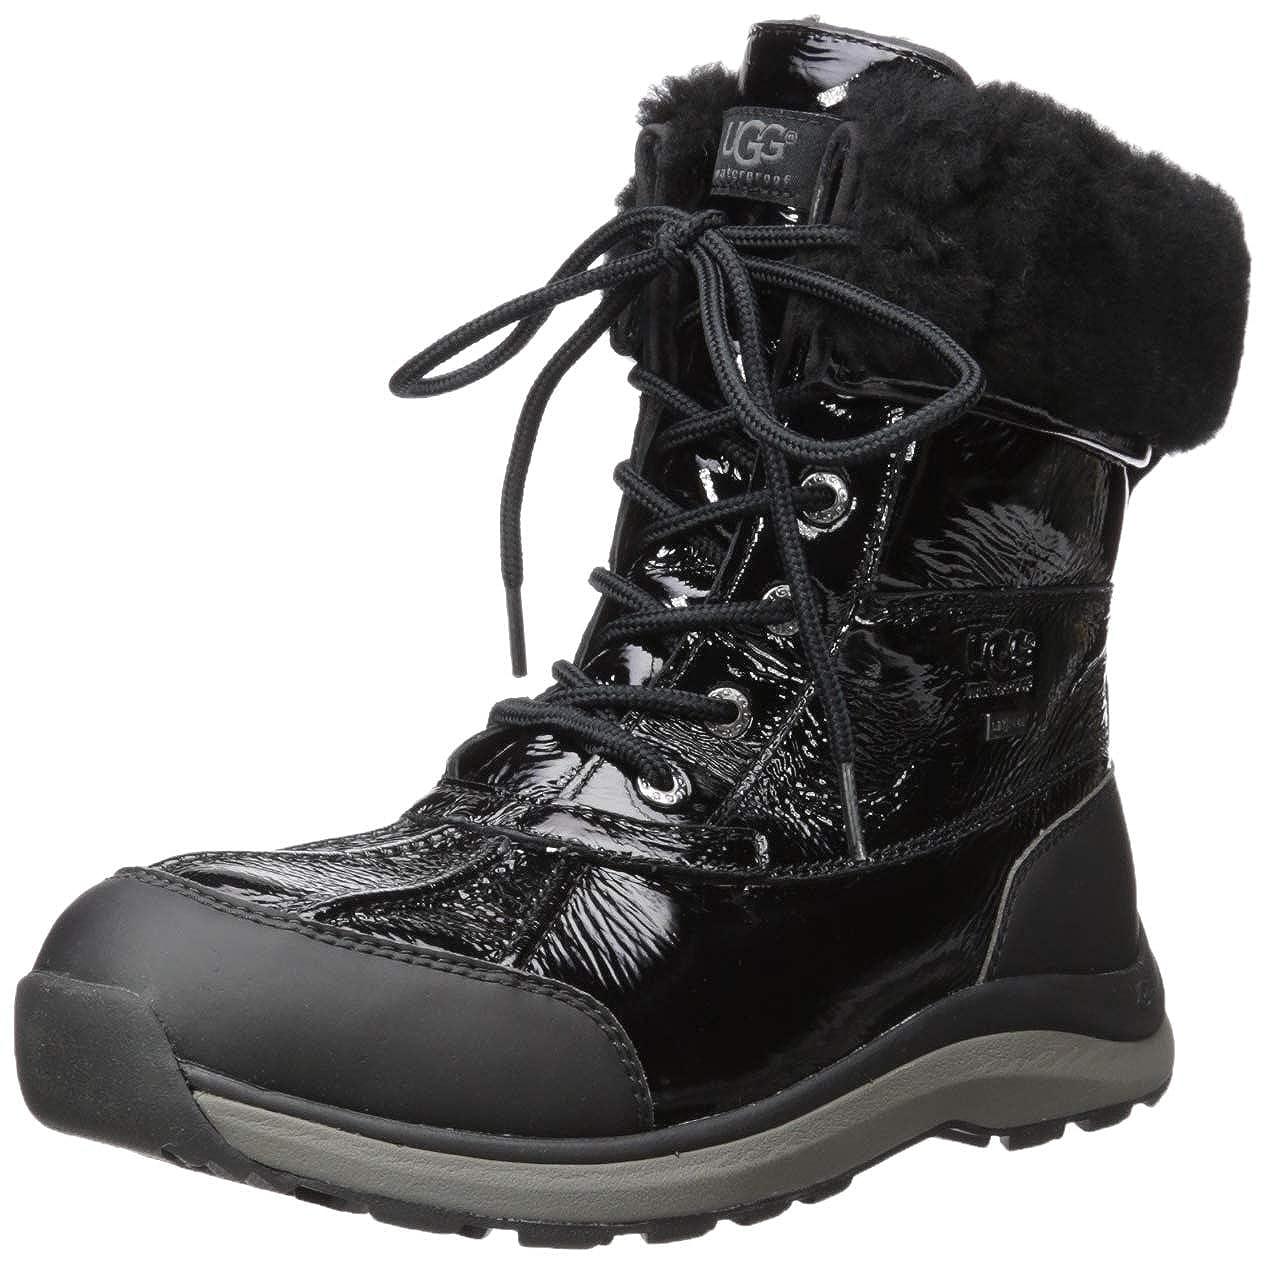 8ec10d1559d UGG Women's W Adirondack III Patent Snow Boot Black: Amazon.co.uk ...